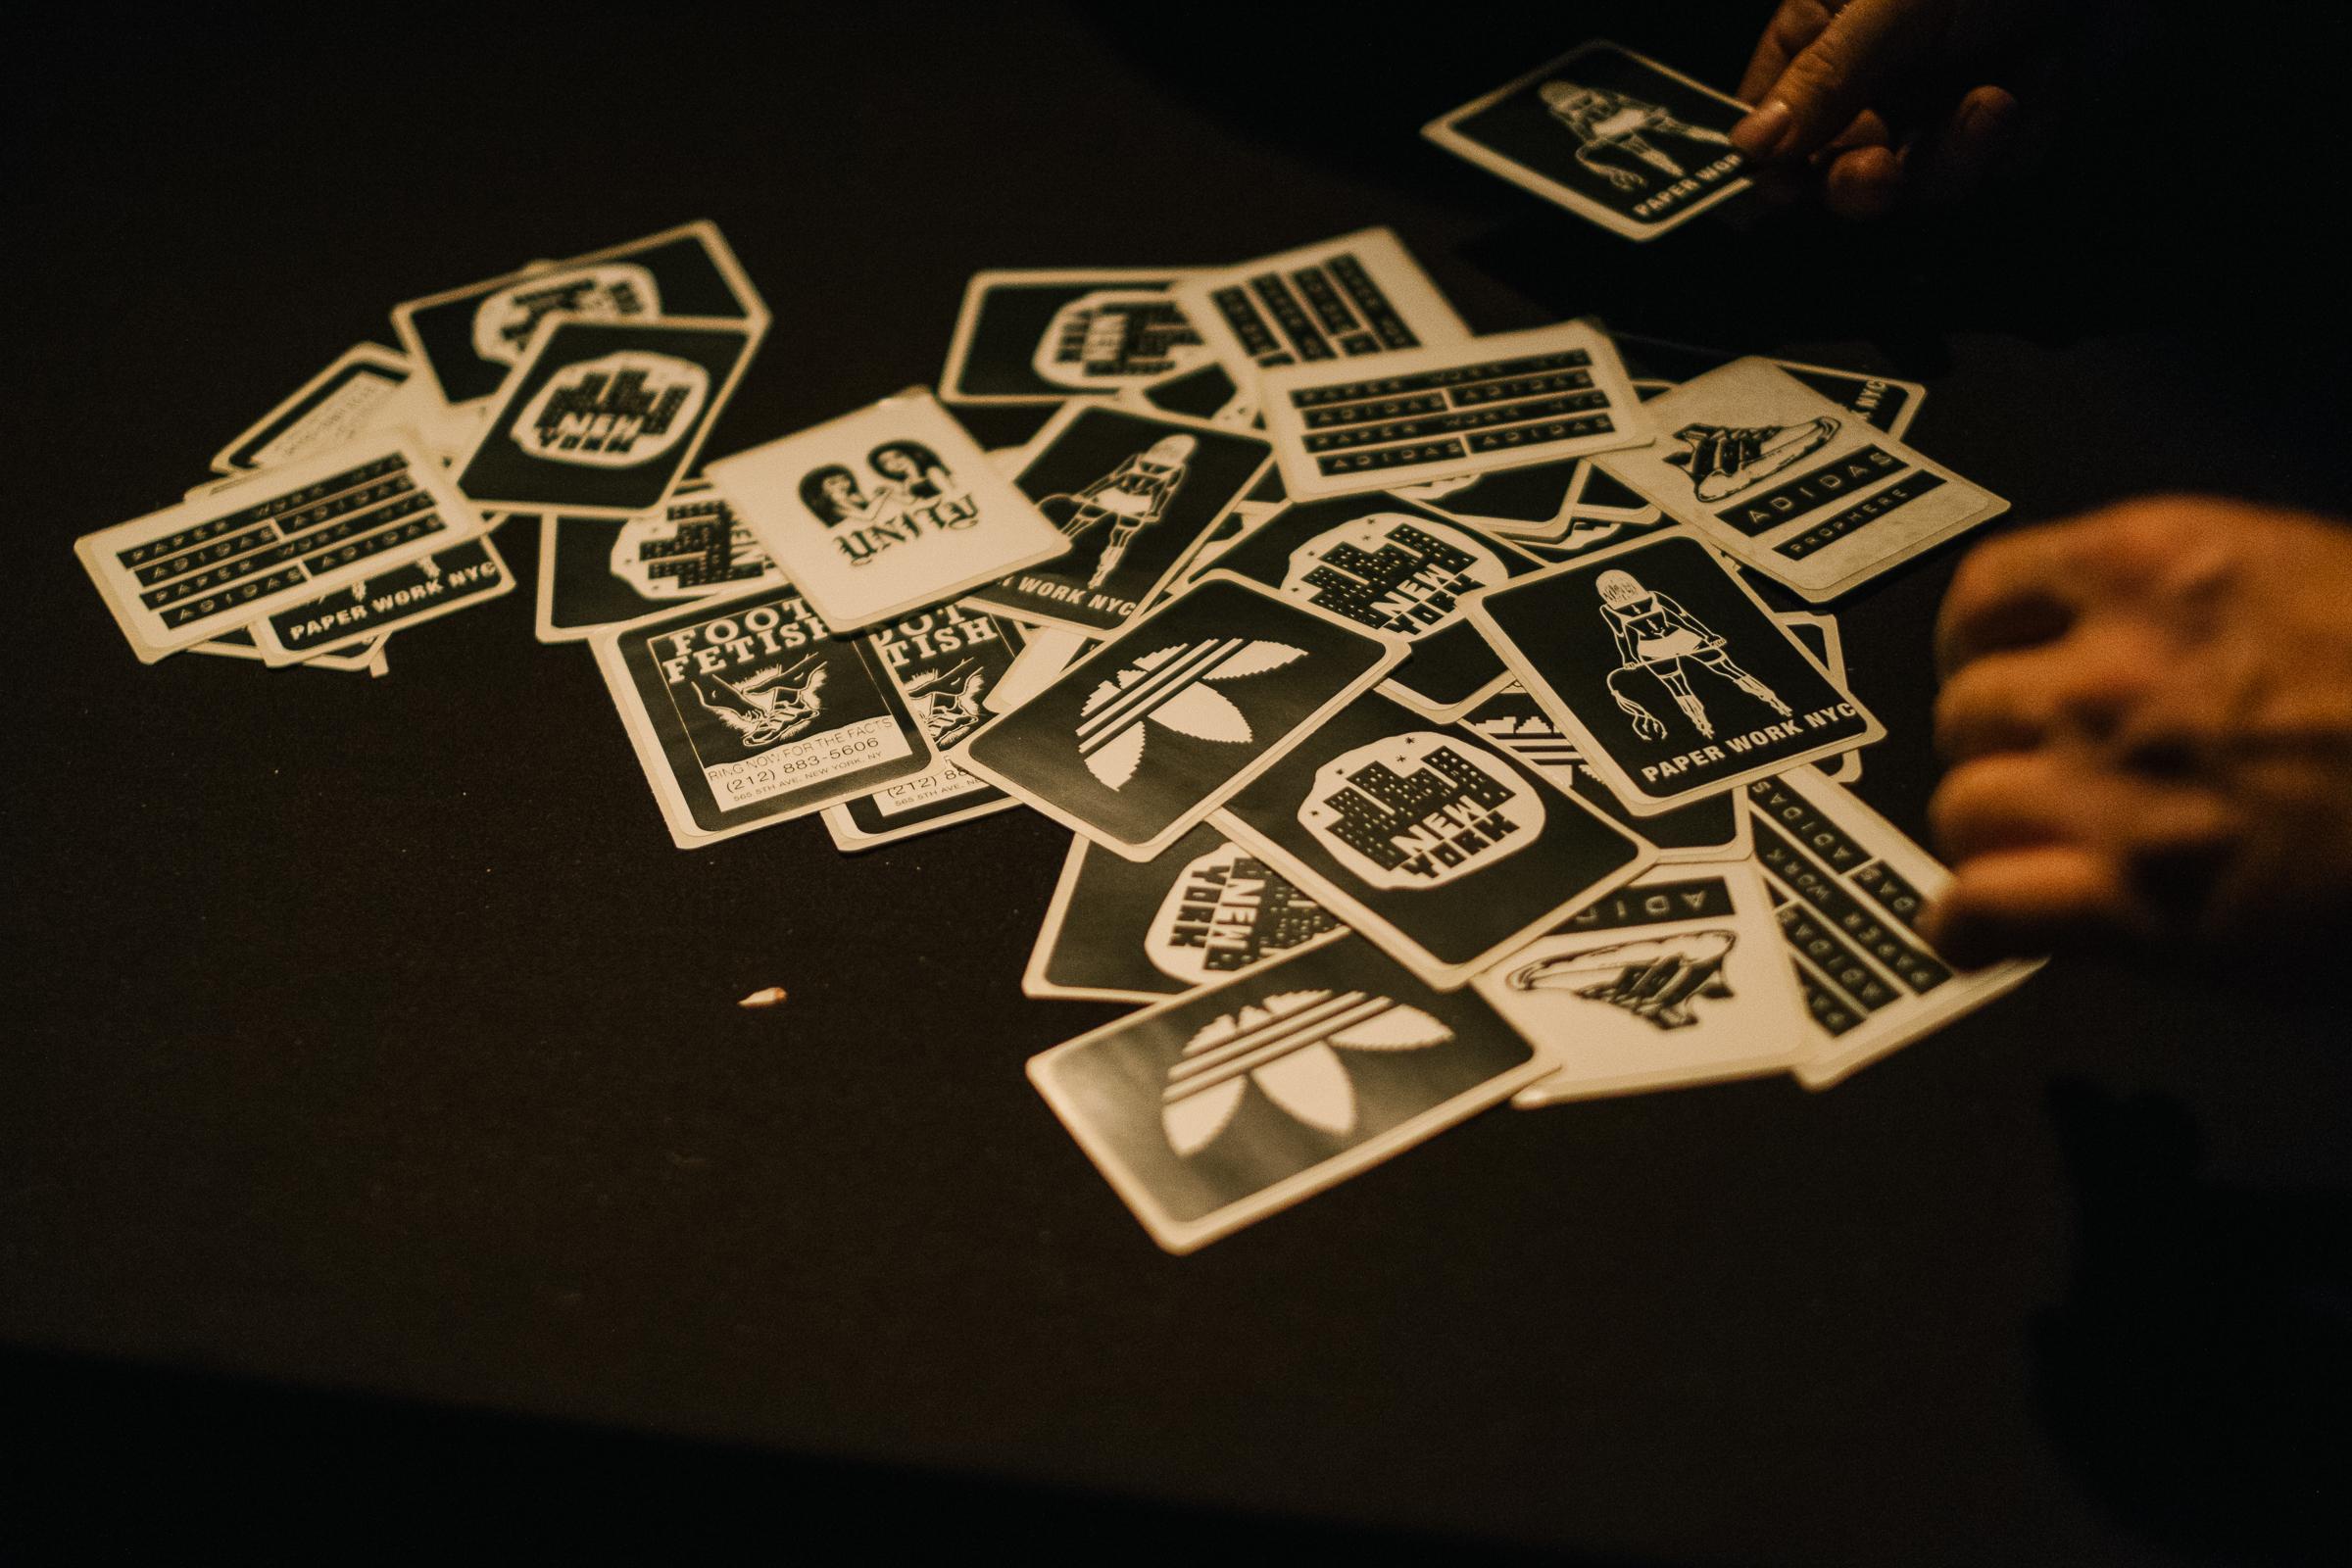 LF_PaperworkNYC+x+Adidas-58.jpg